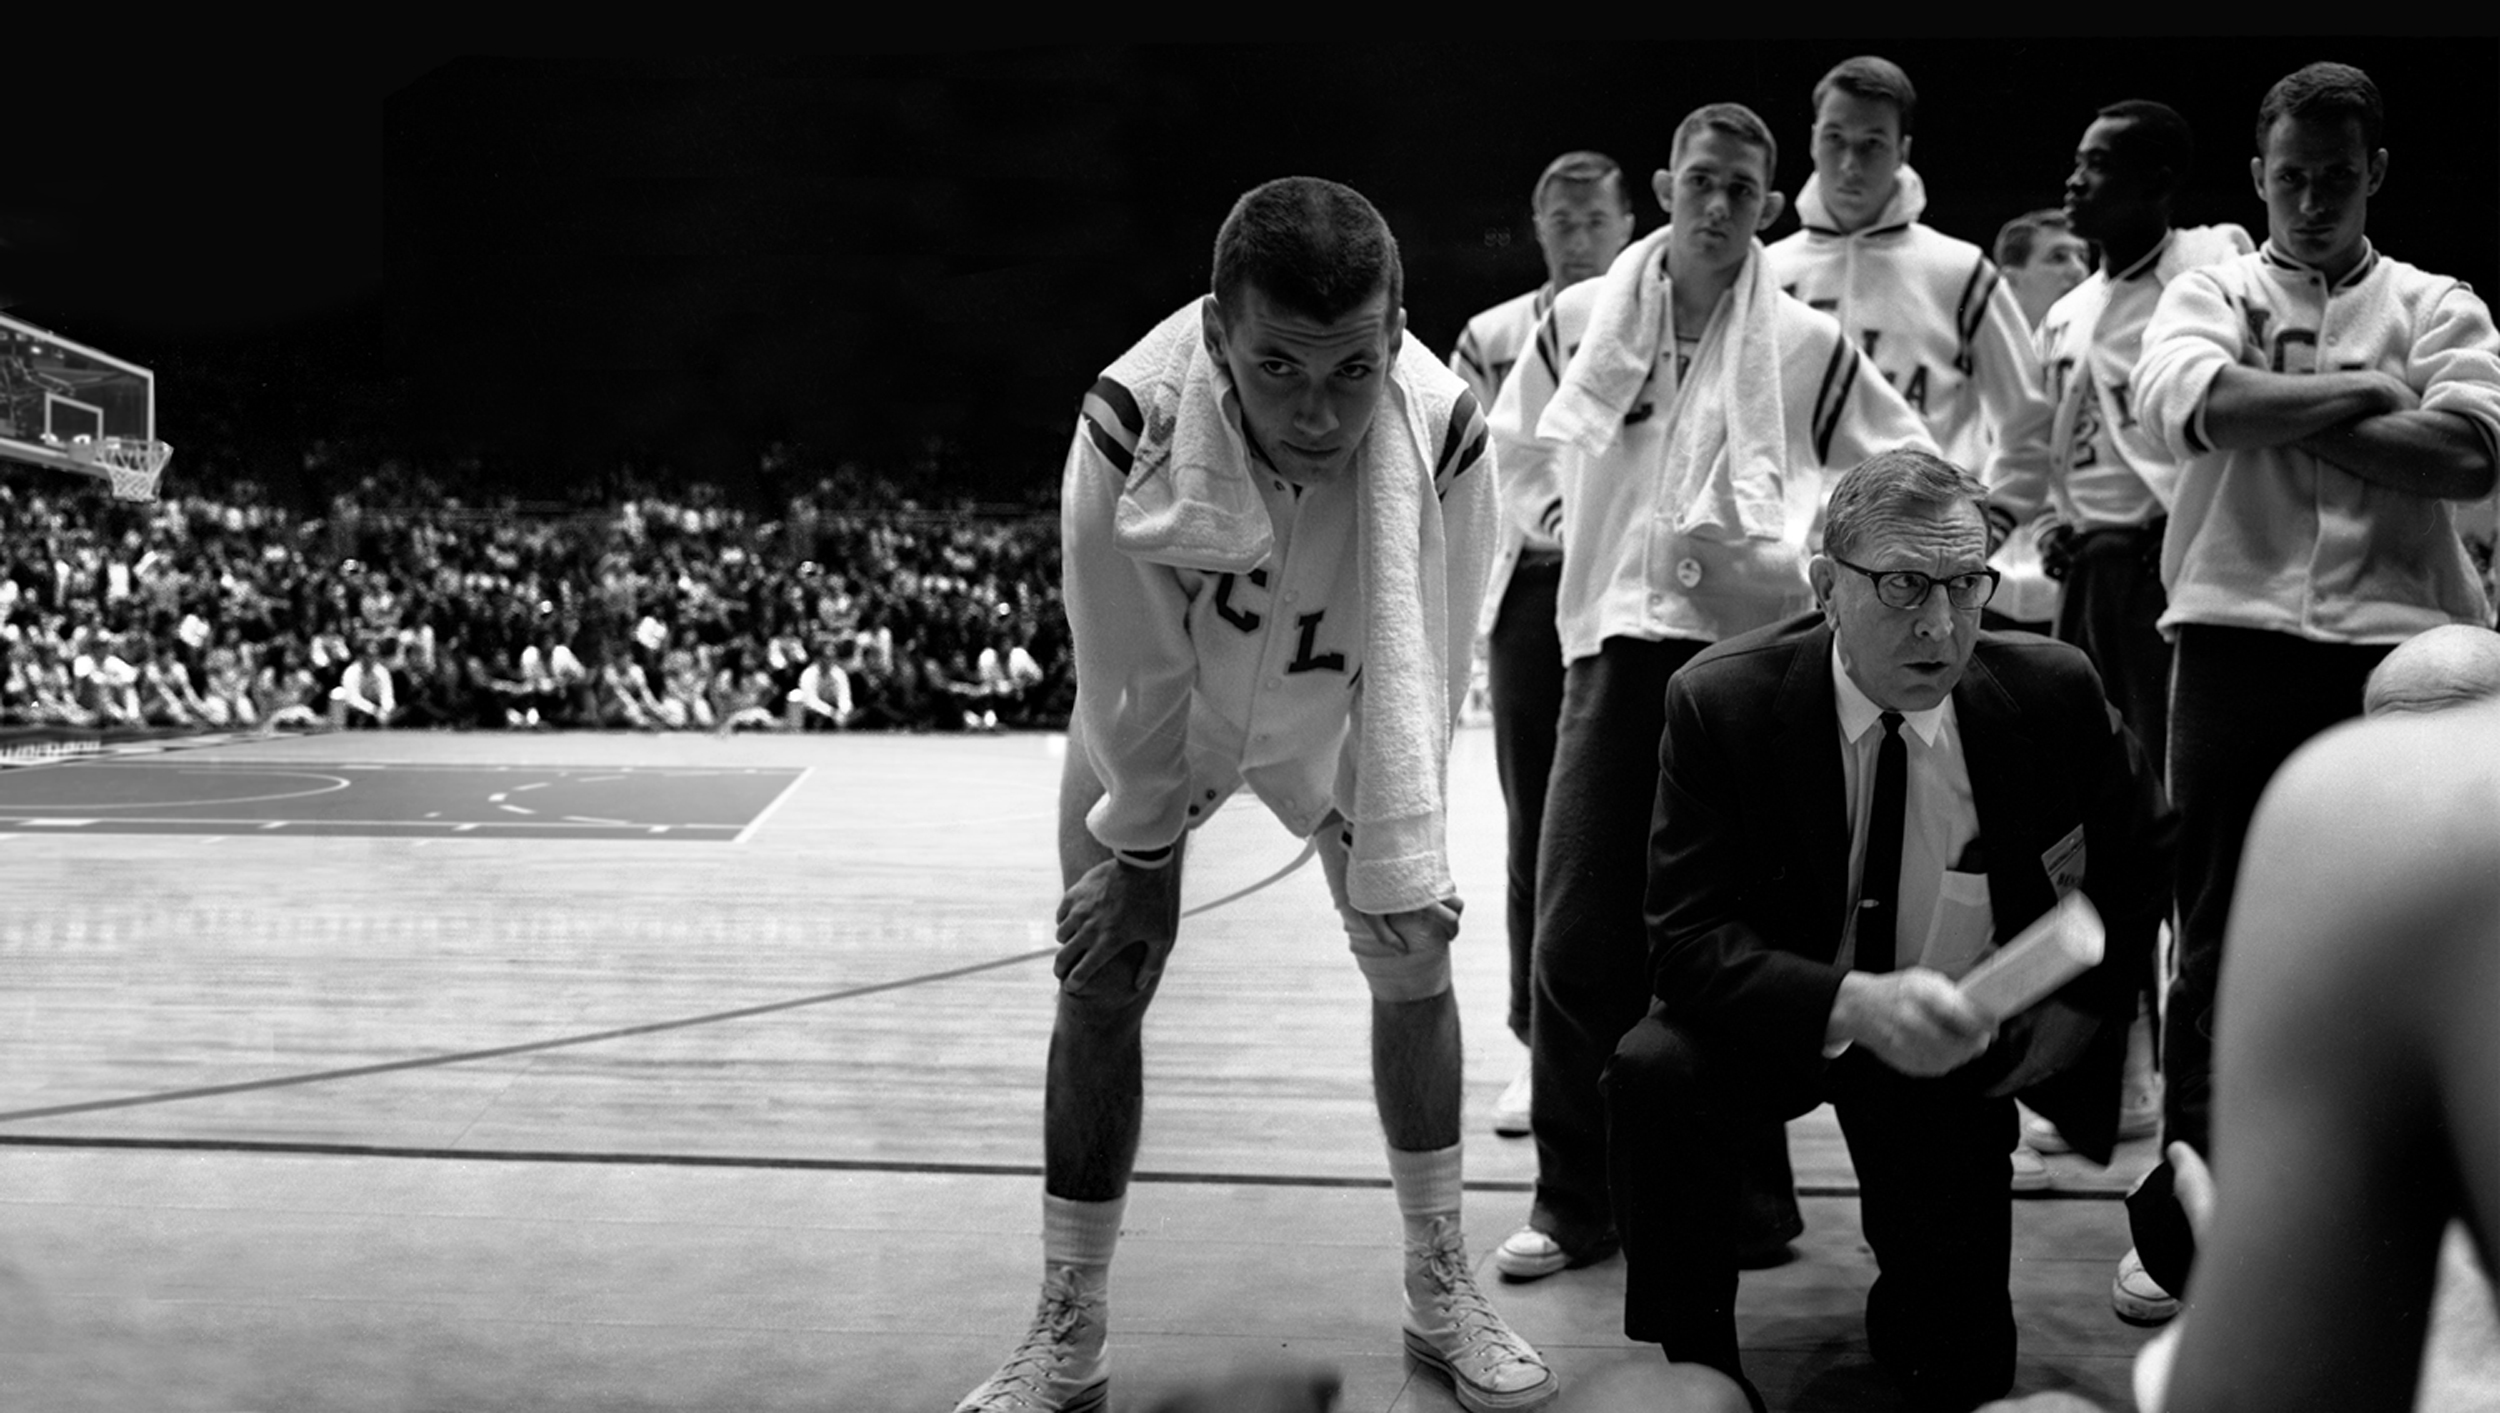 Fabled - John Wooden coaching UCLA basketball team